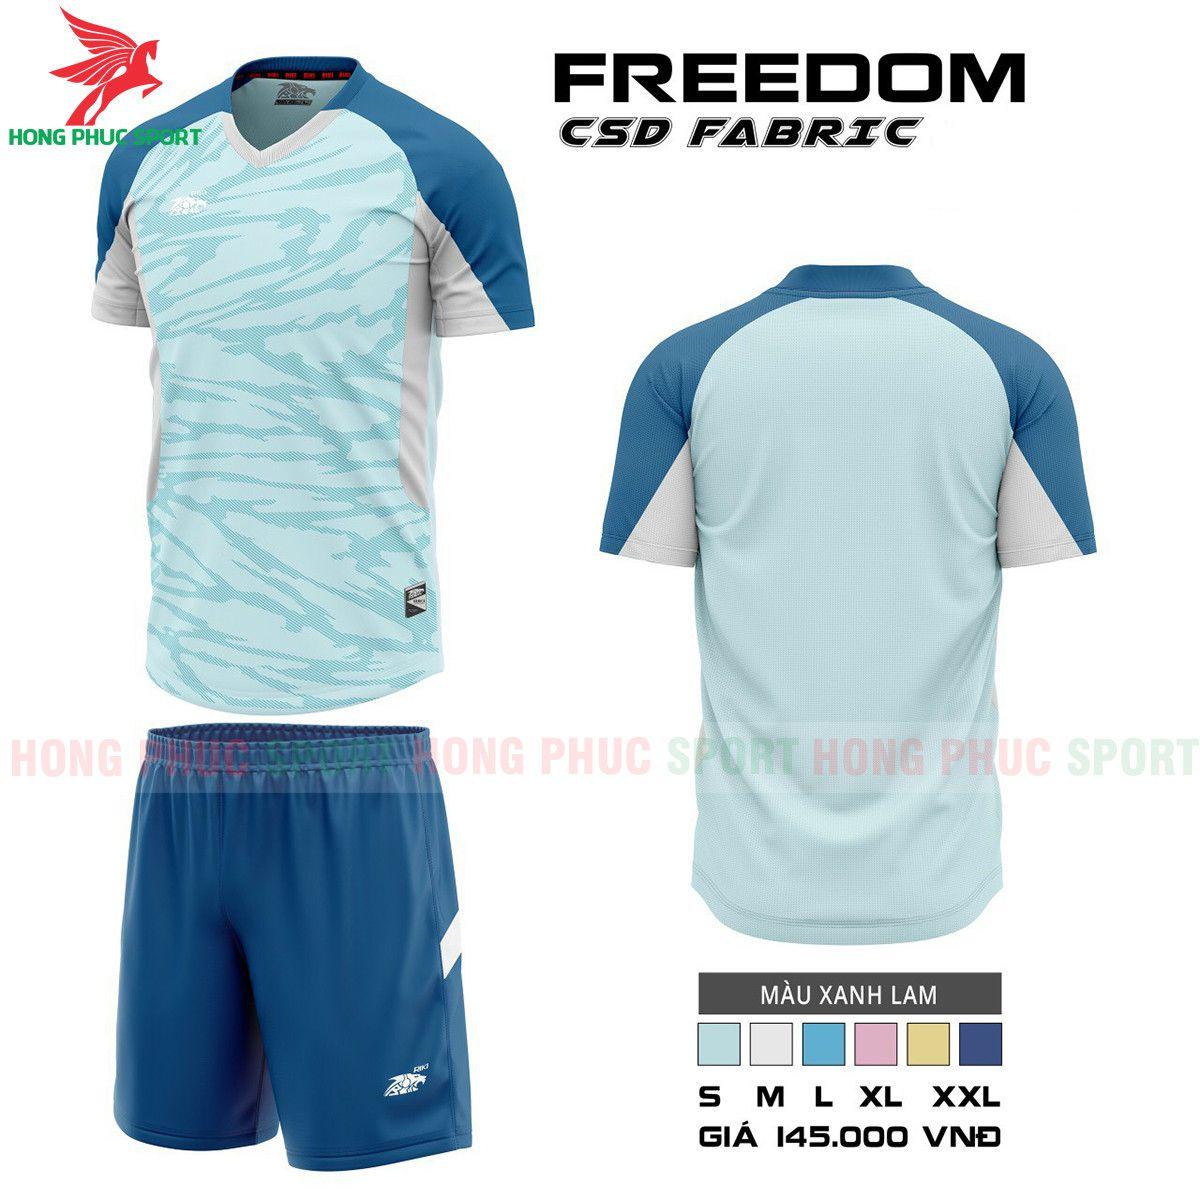 https://cdn.hongphucsport.com/unsafe/s4.shopbay.vn/files/285/ao-khong-logo-riki-freedom-2021-mau-xanh-ngoc-6156830ee2049.jpg